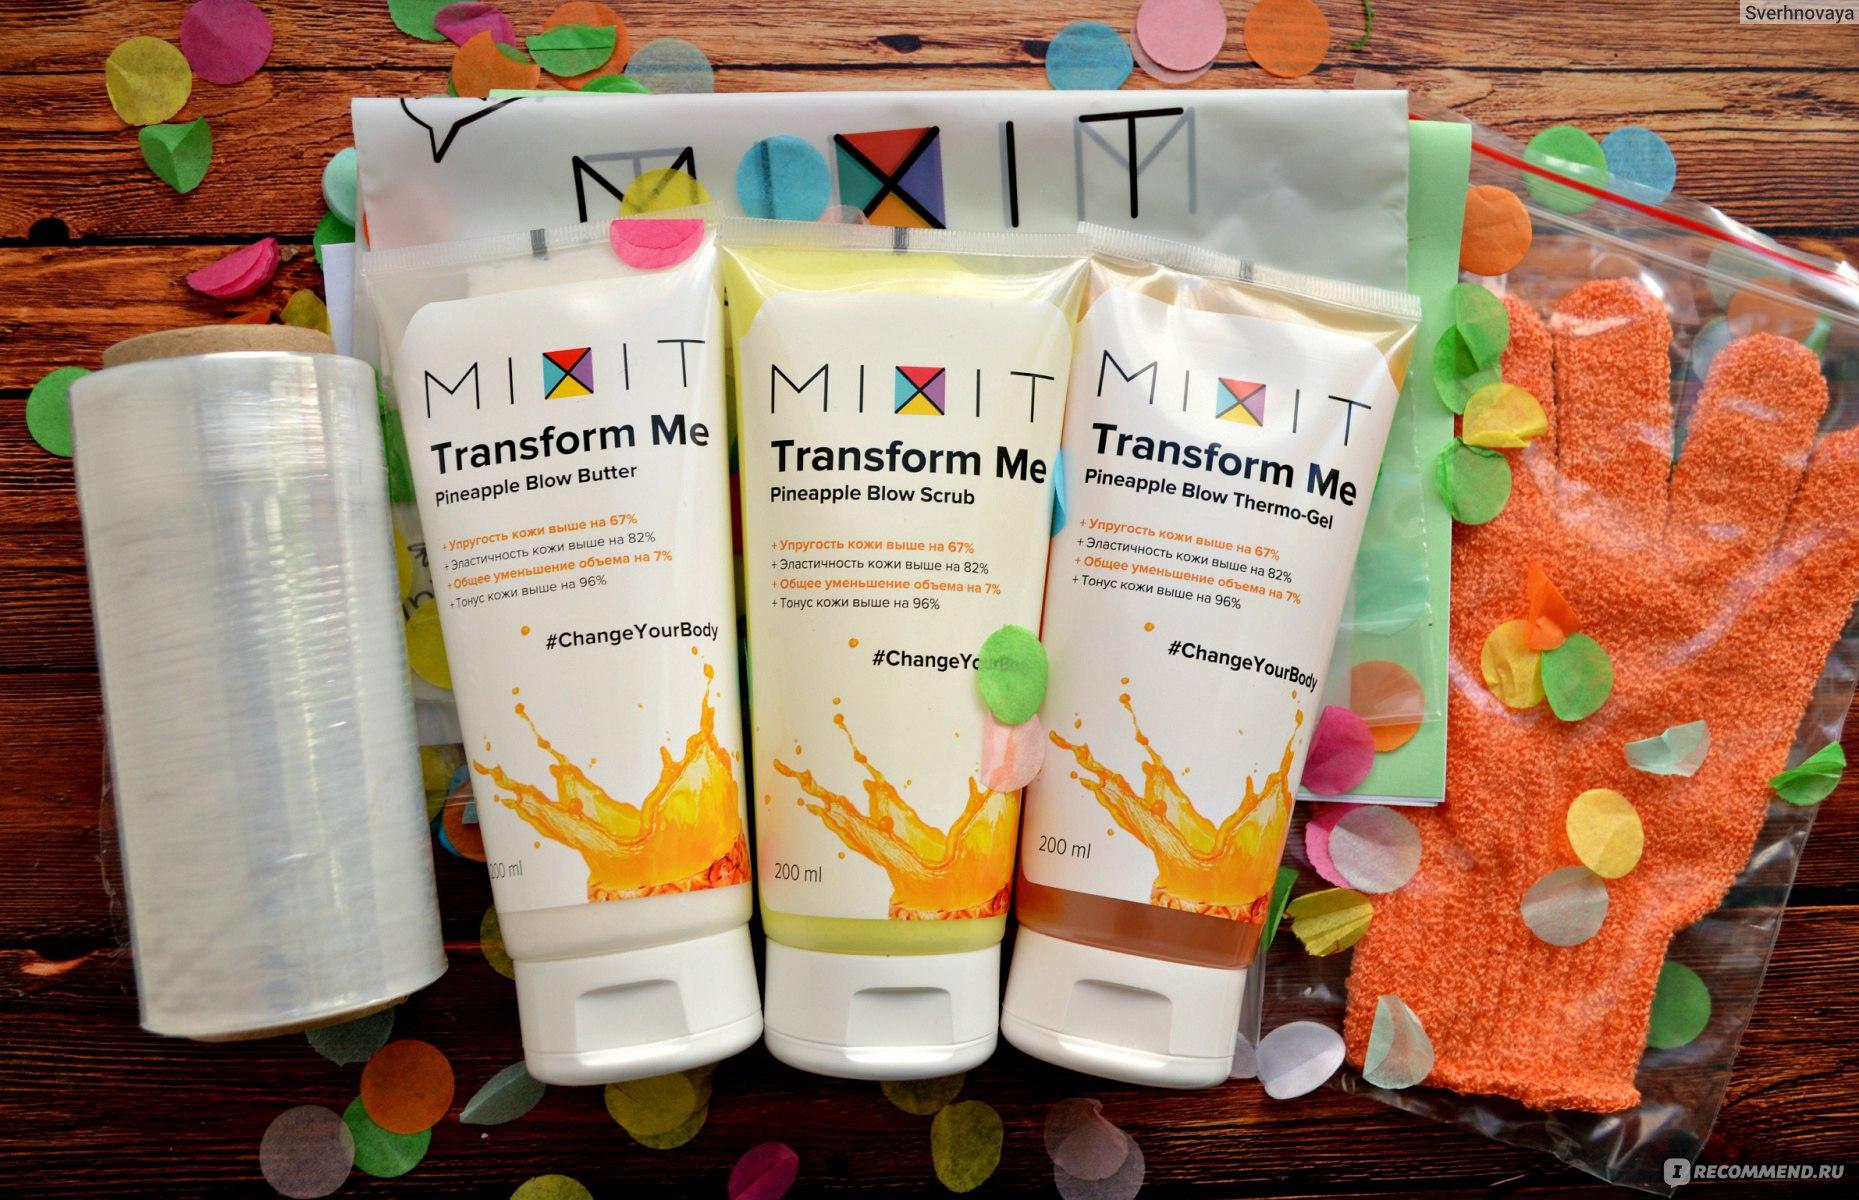 Mixit косметика в украине купить купить косметику гидропептид в москве